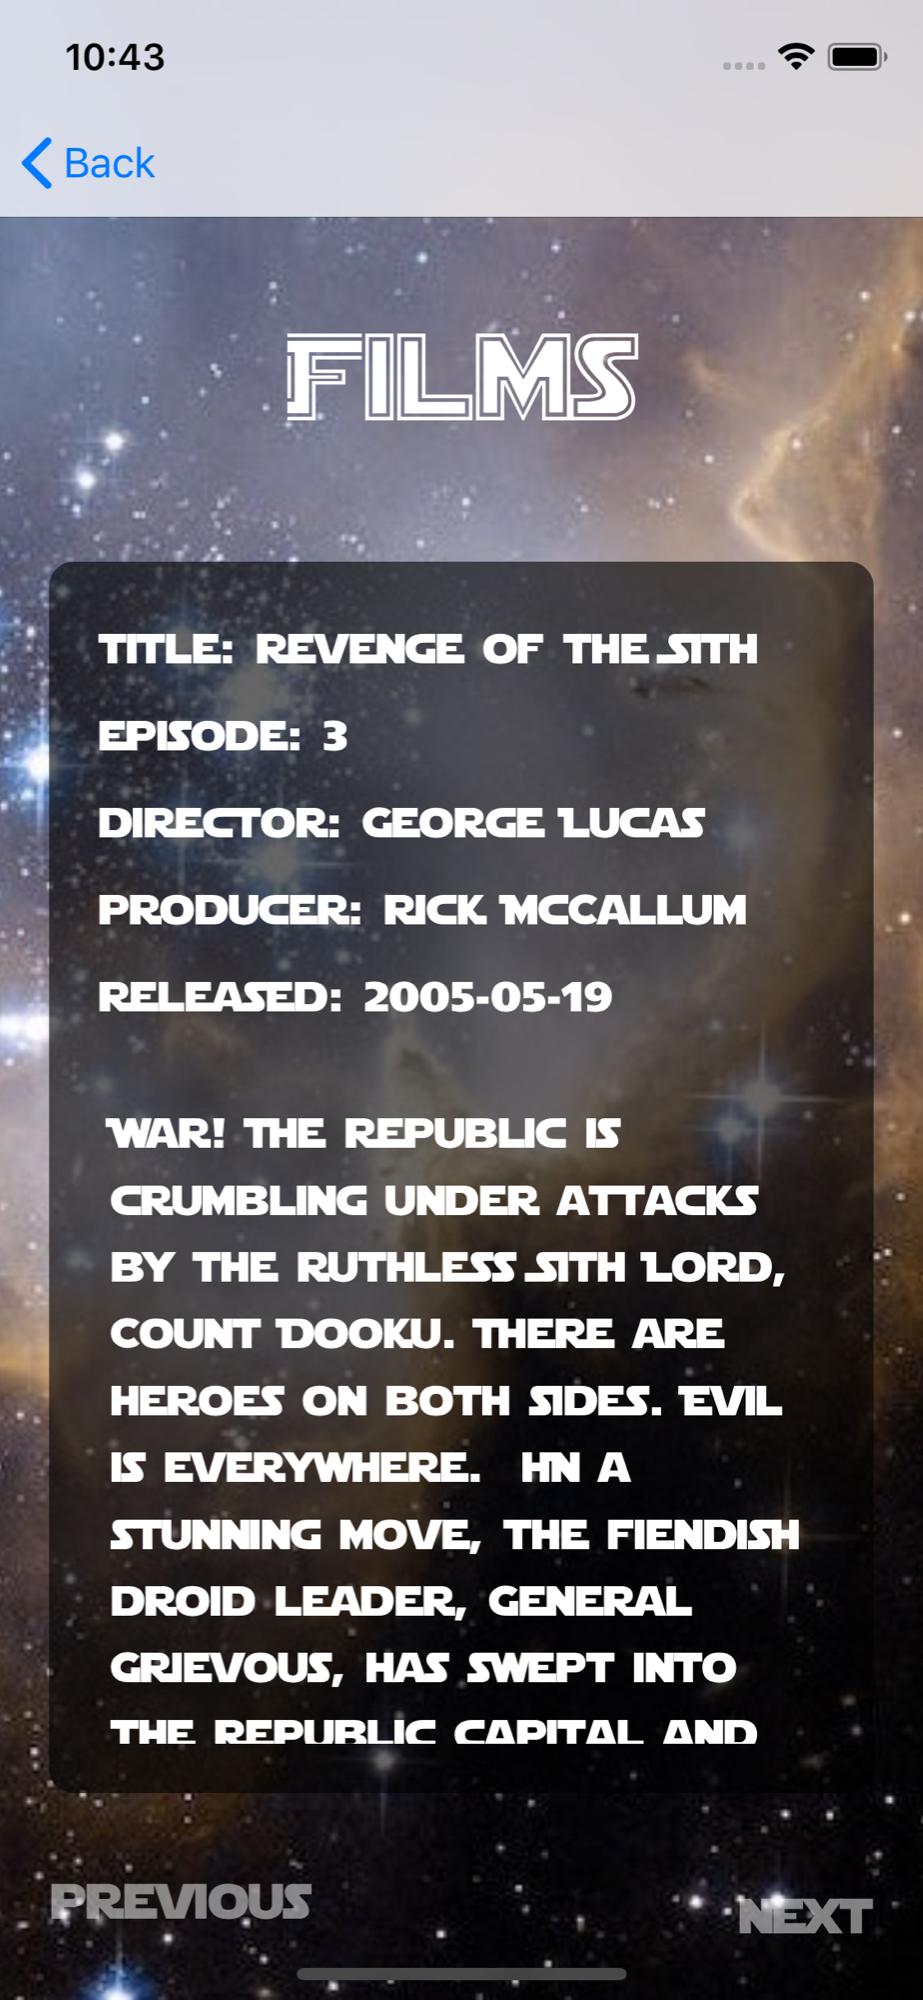 Star Wars Wiki Preview 3